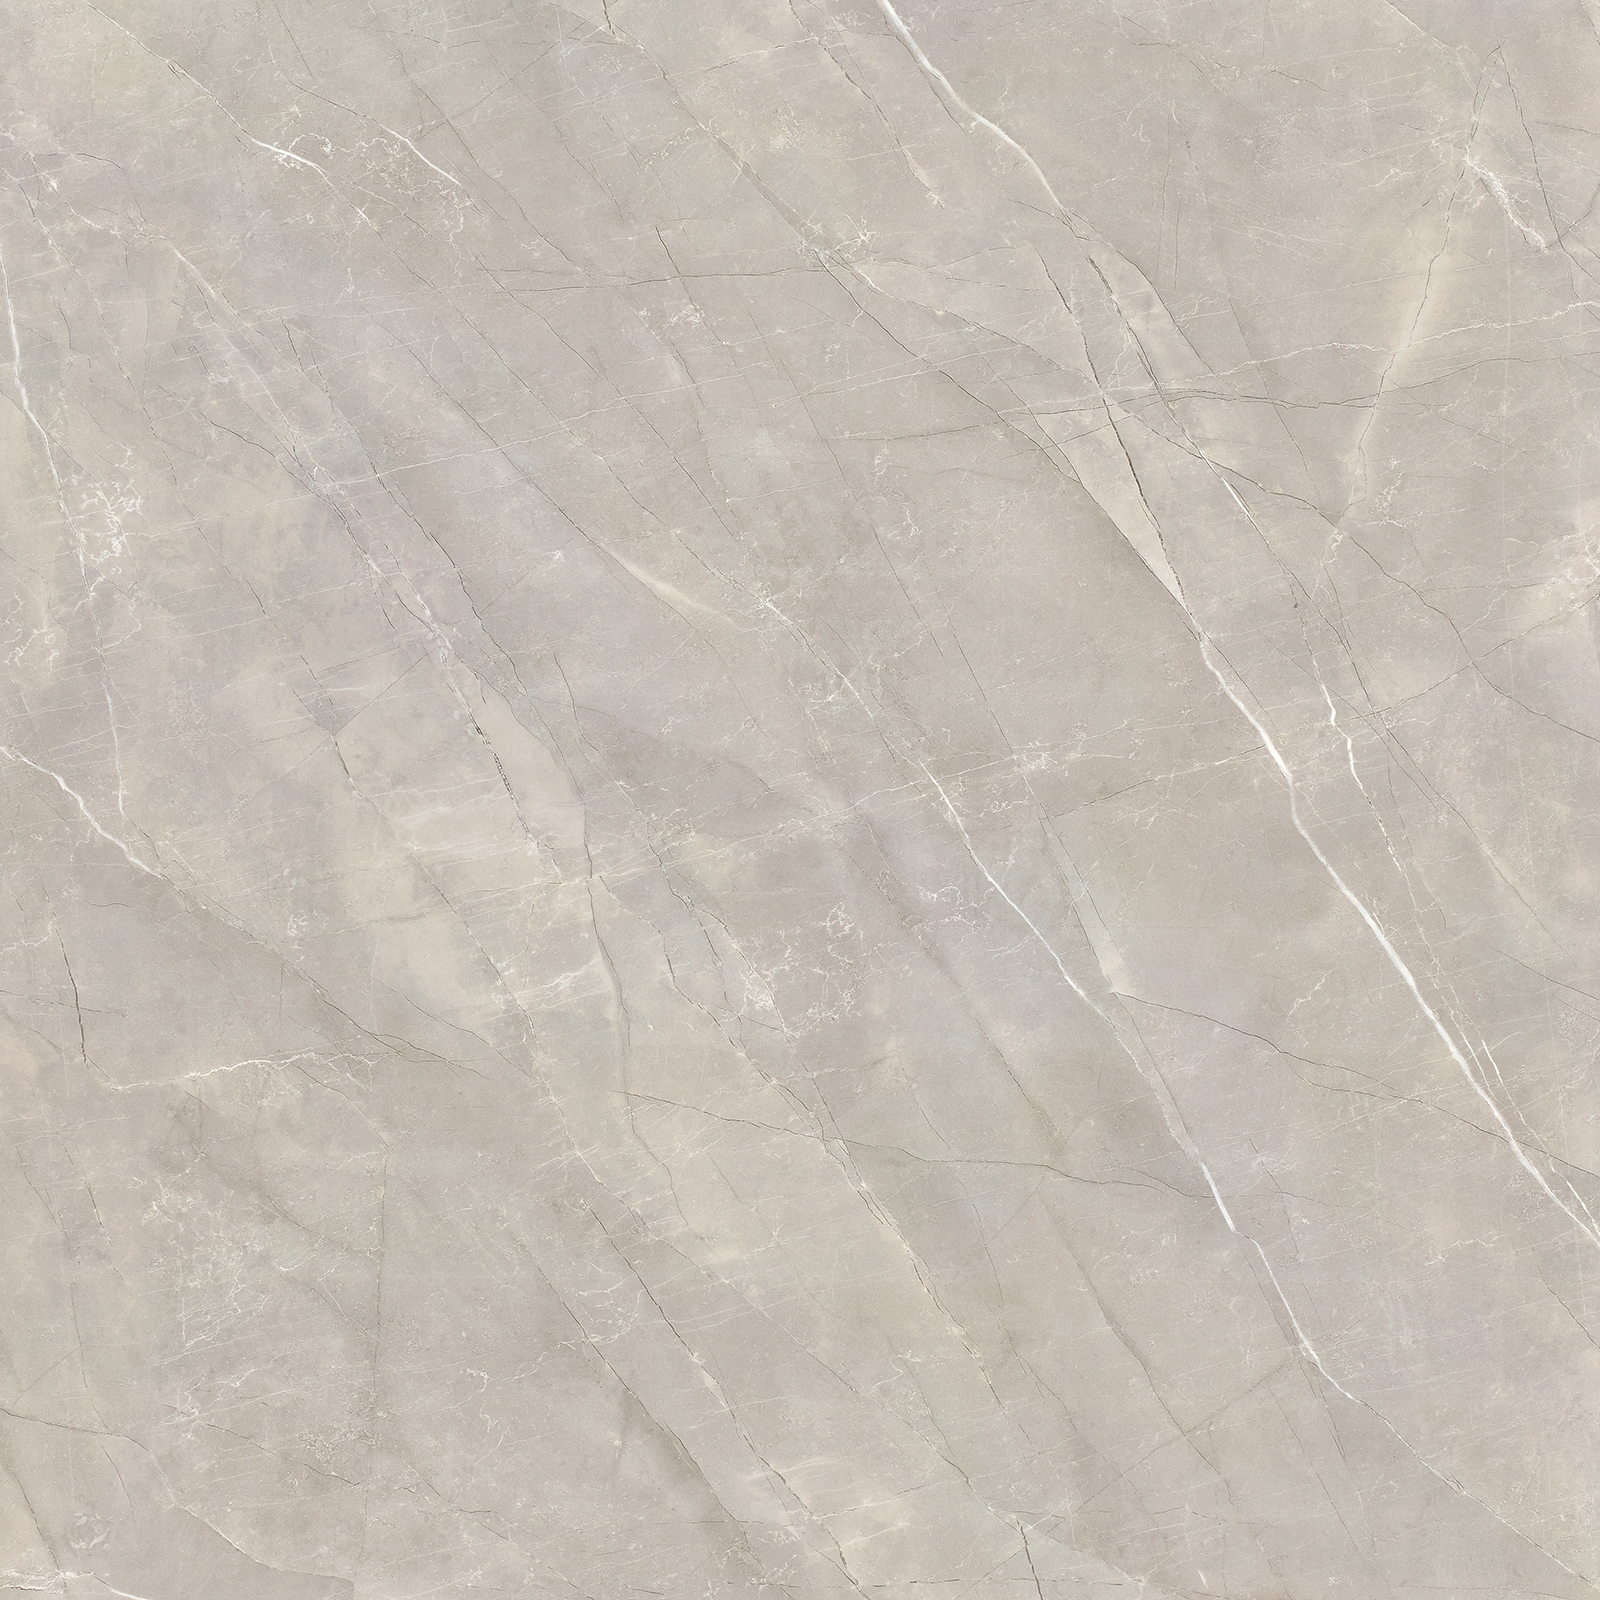 TLK08156R 托拉斯石